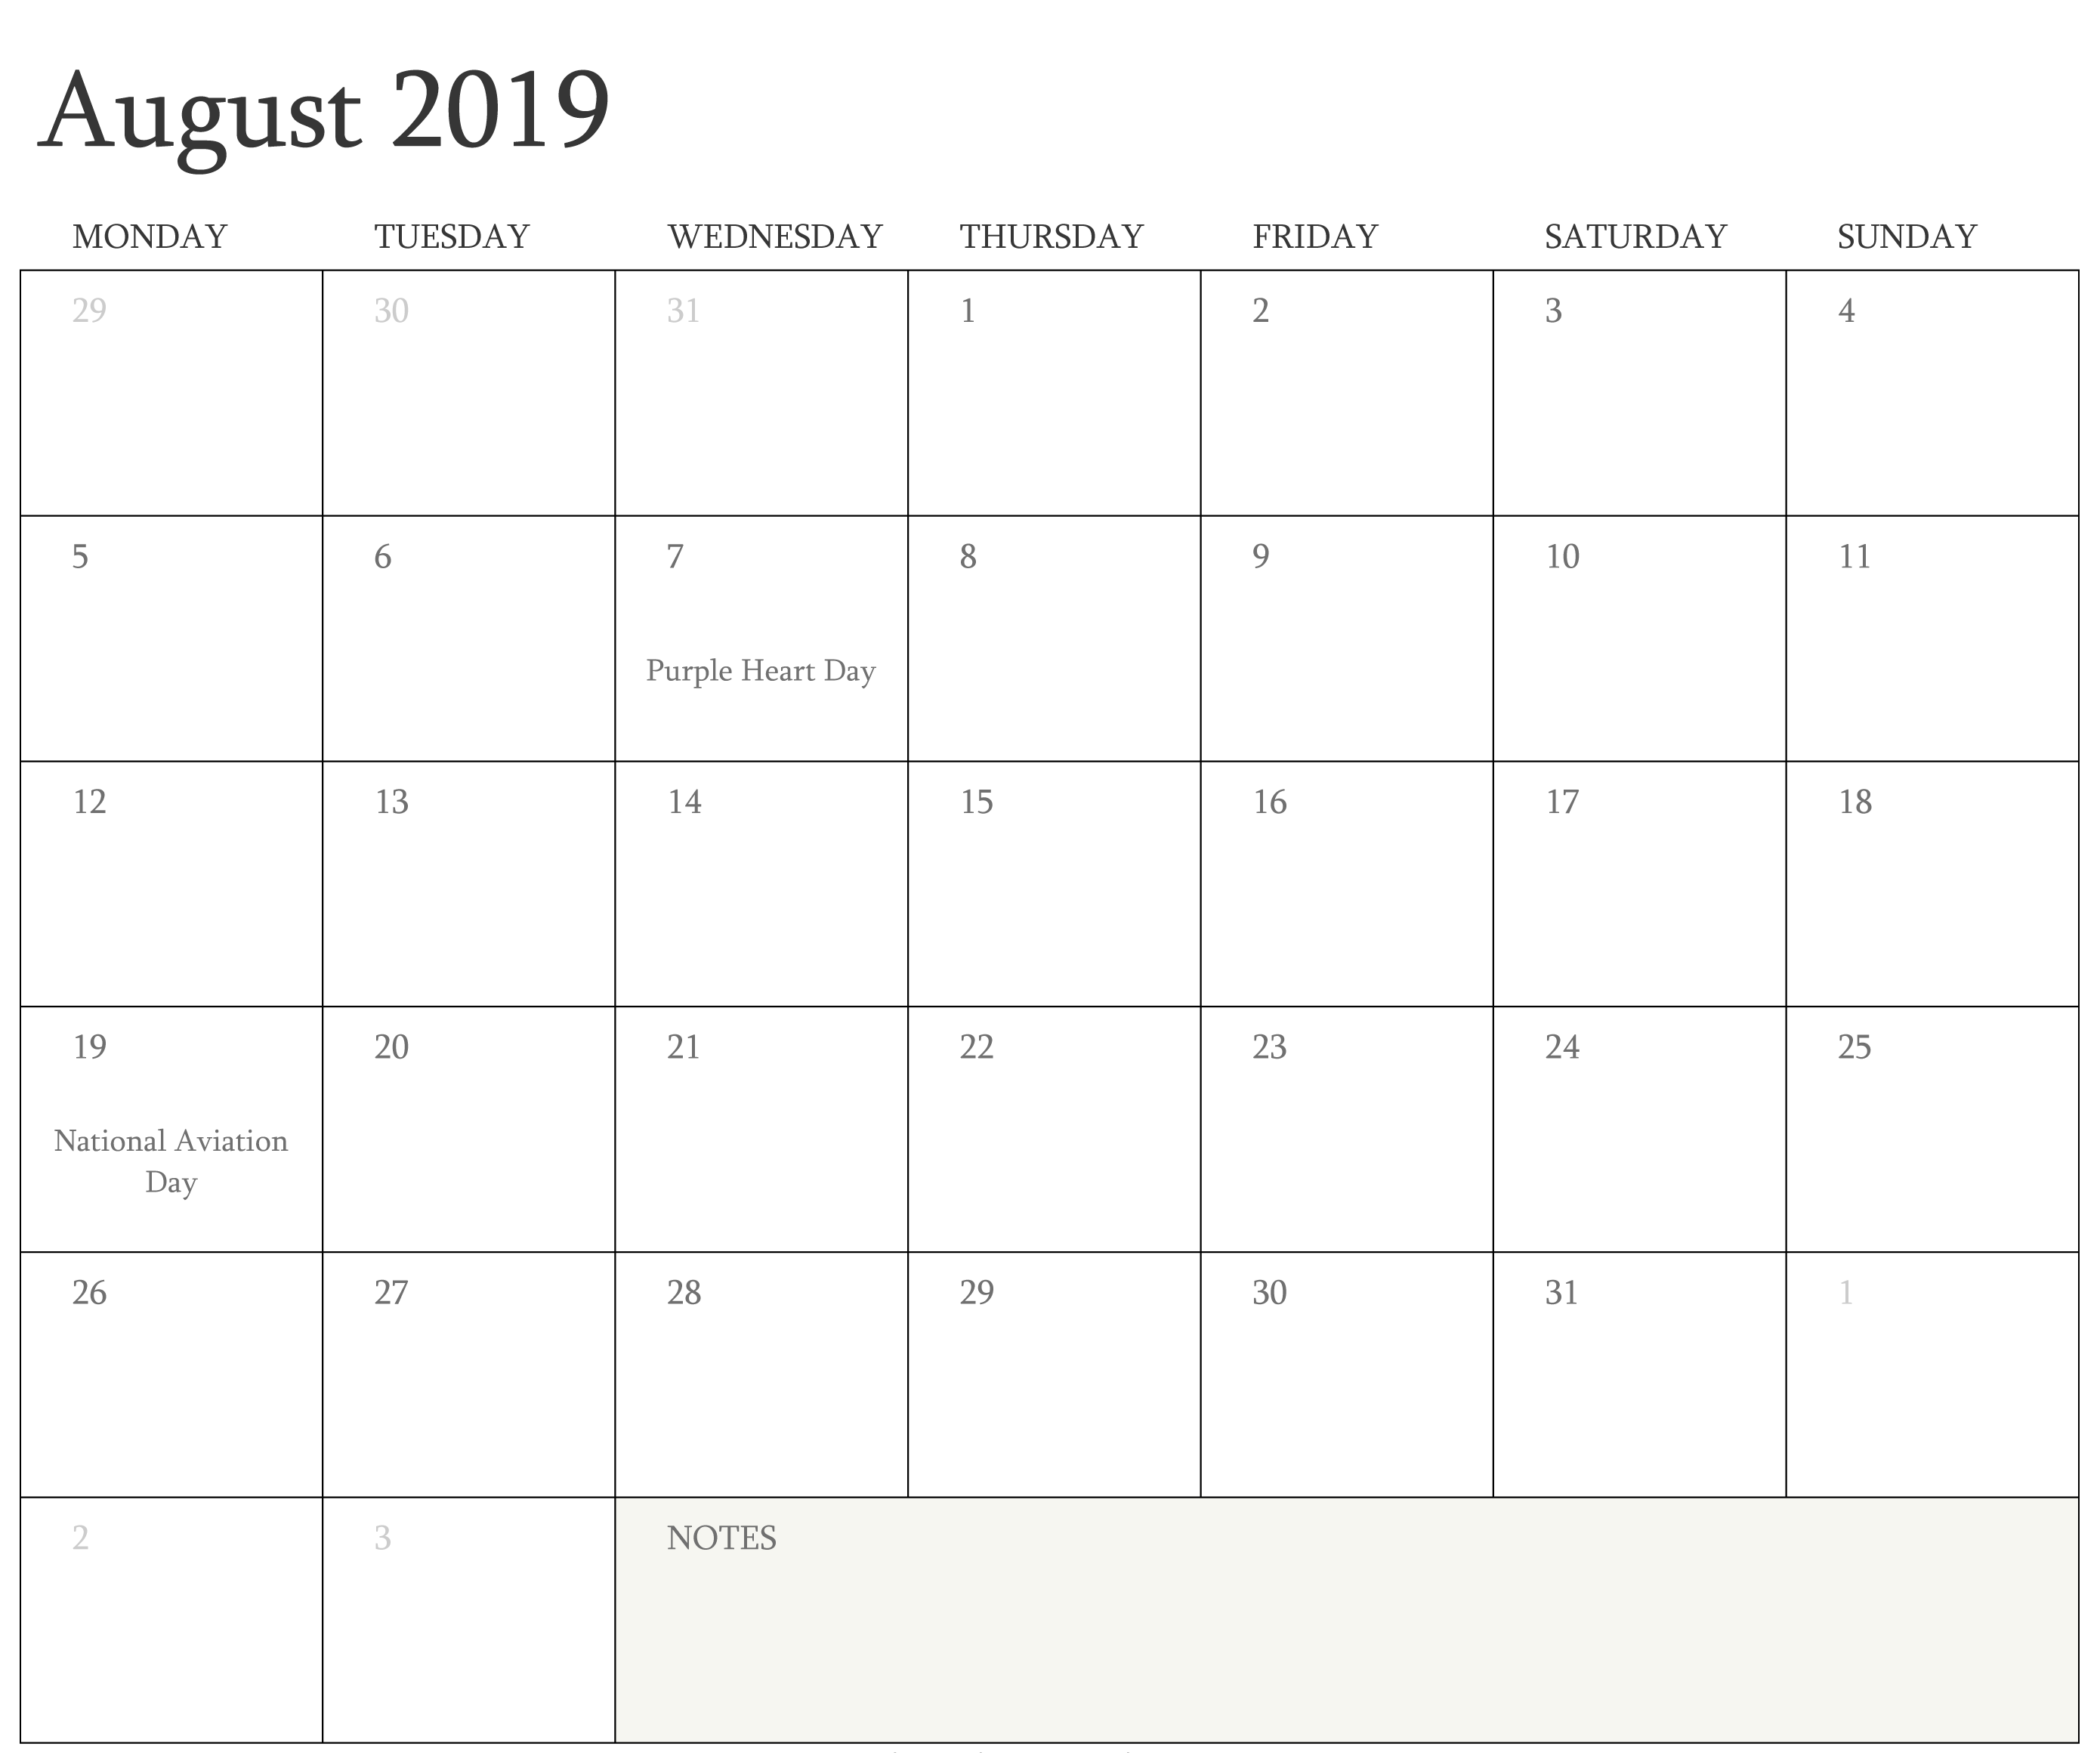 August 2019 Calendar Holidays